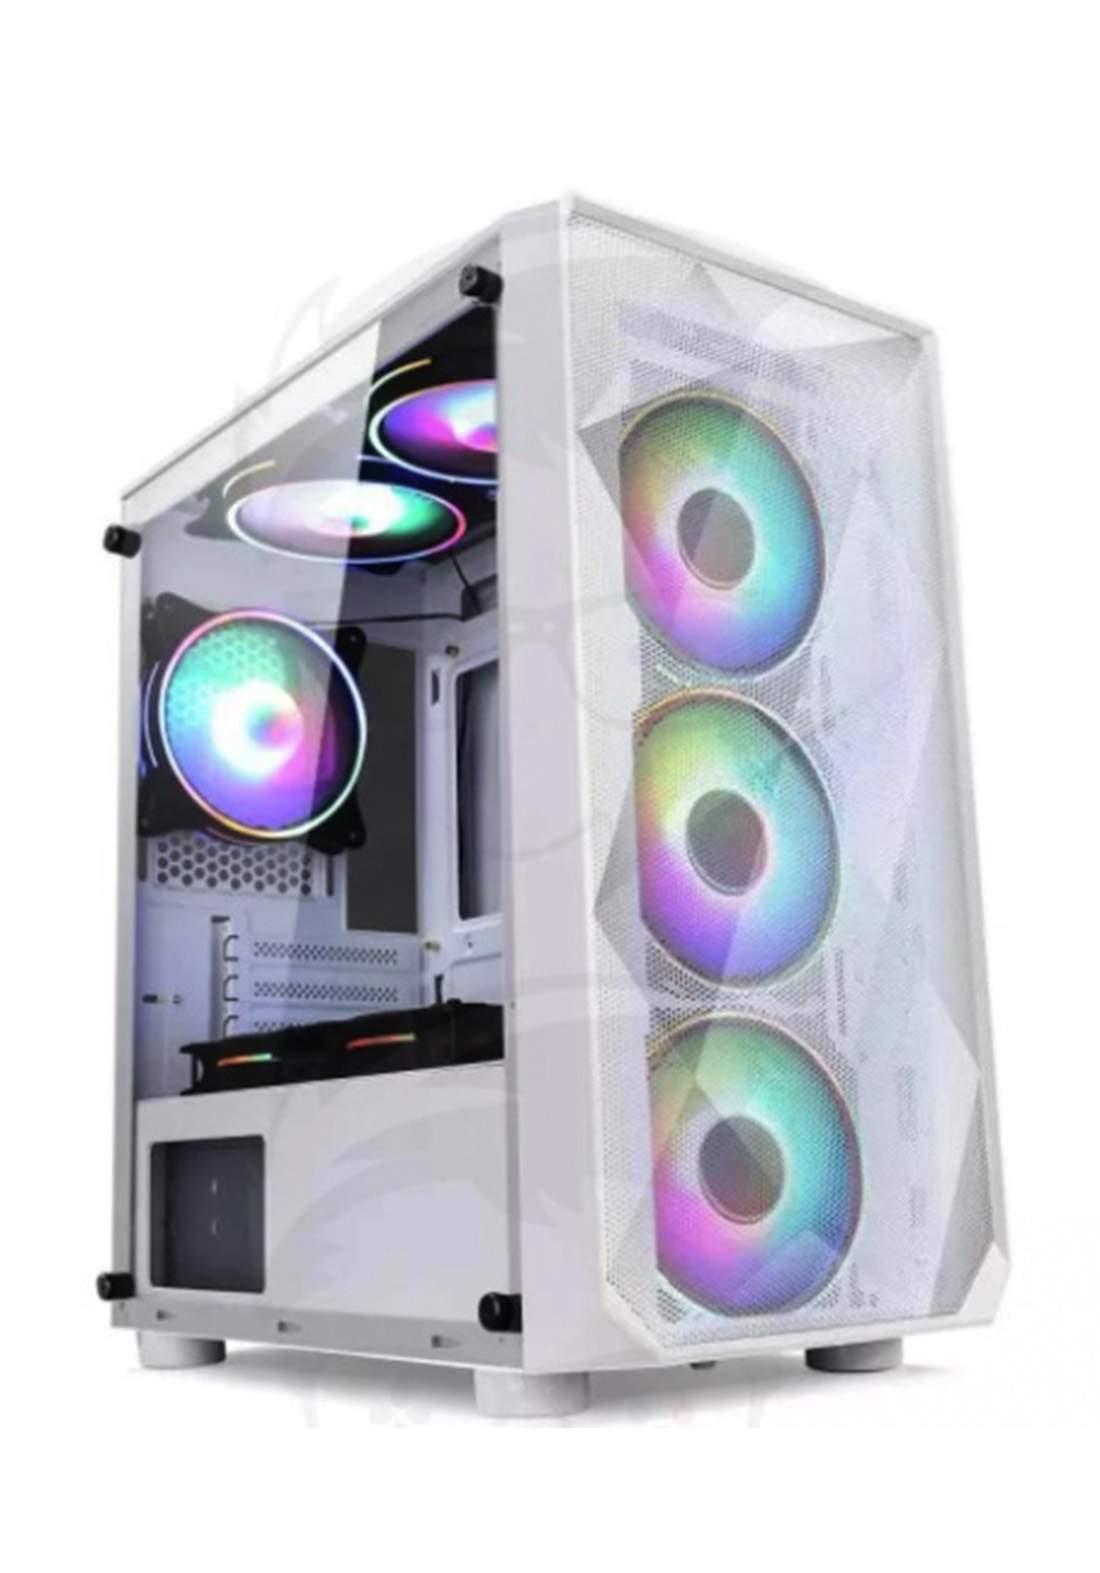 Power Train Magic Box Computer Case 3Fans - White  كيس حاسبة